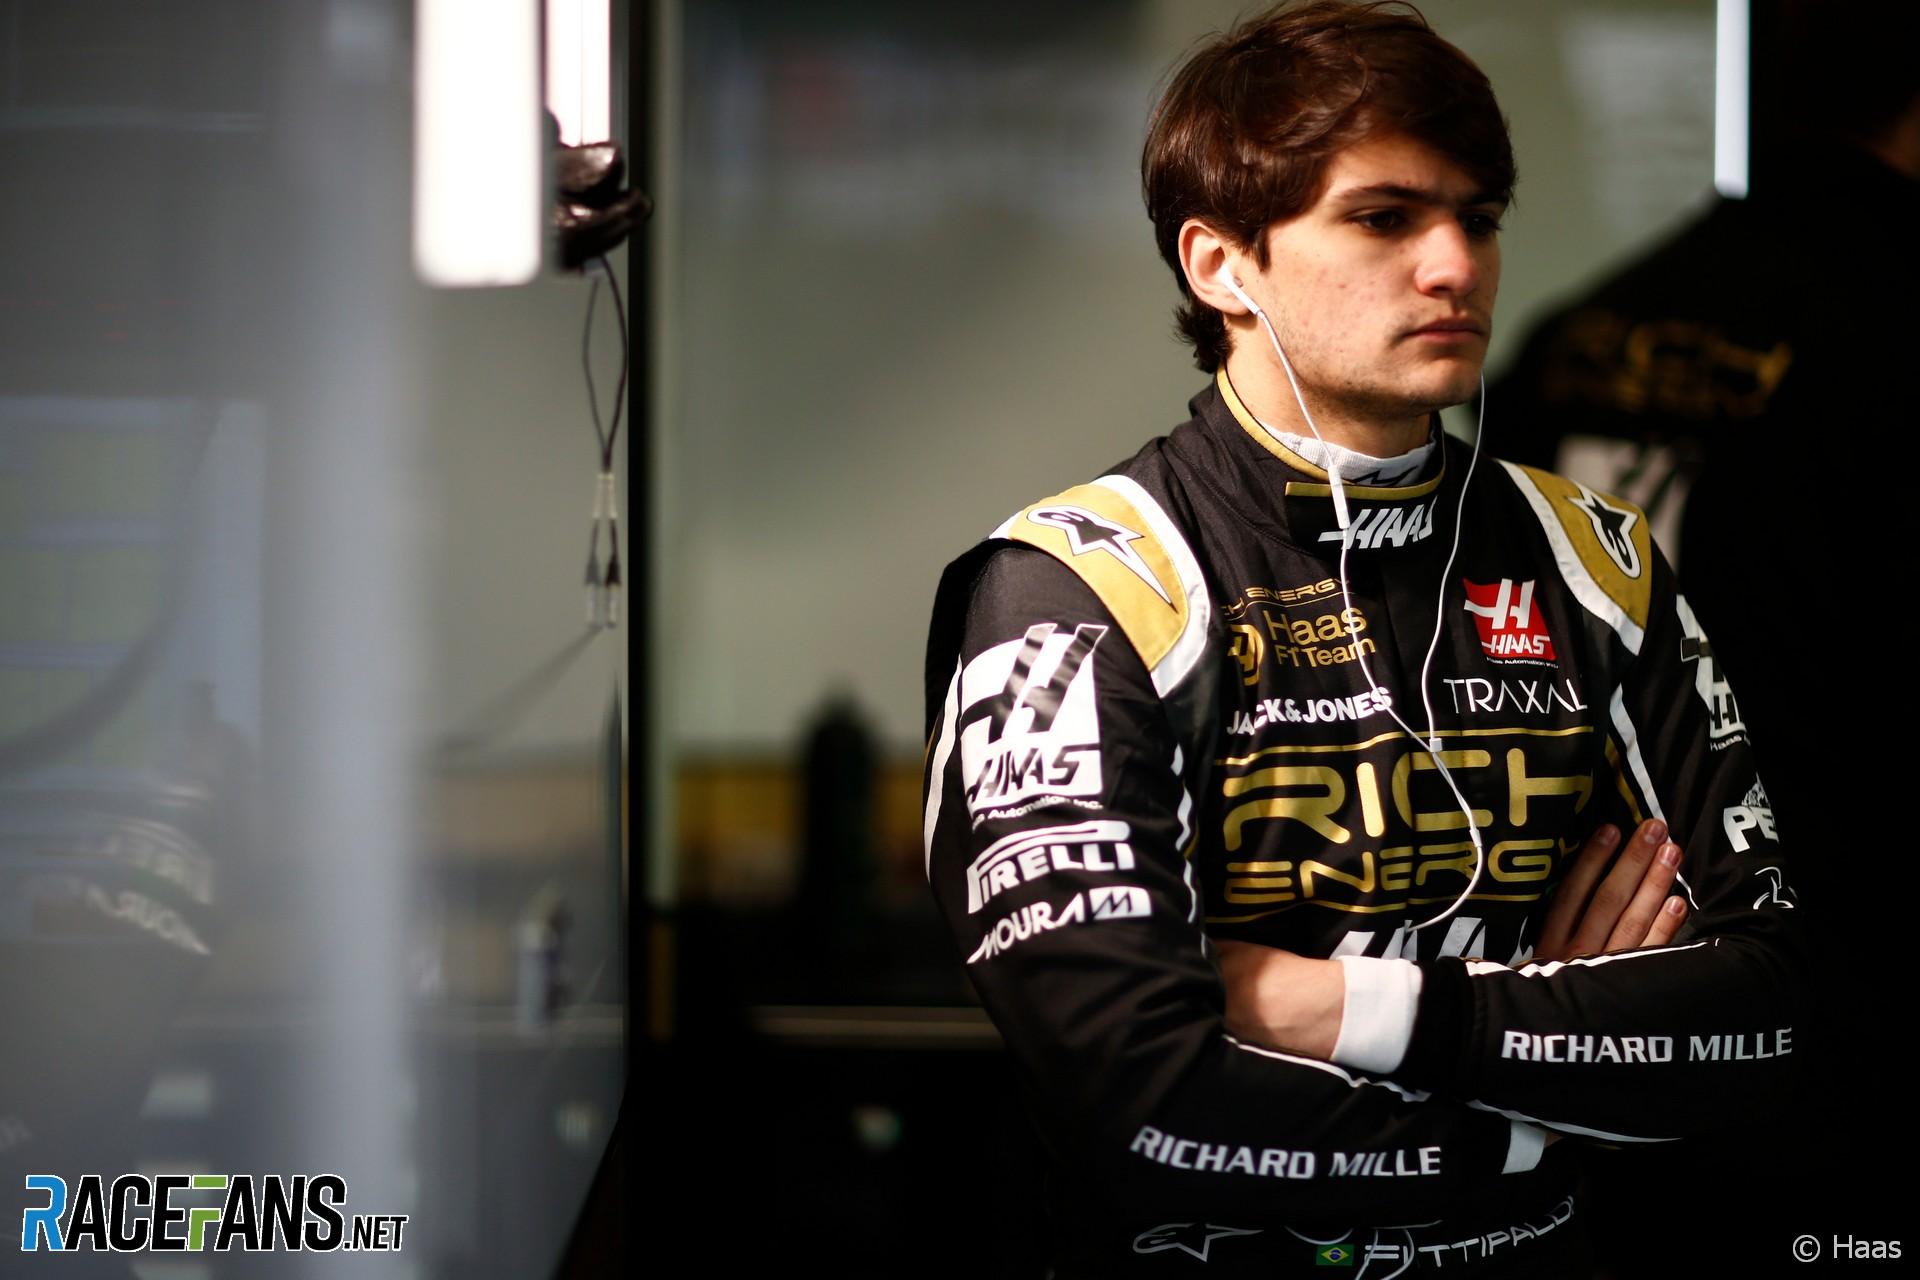 Pietro Fittipaldi to make F1 debut as Grosjean's substitute at Sakhir Grand Prix · RaceFans